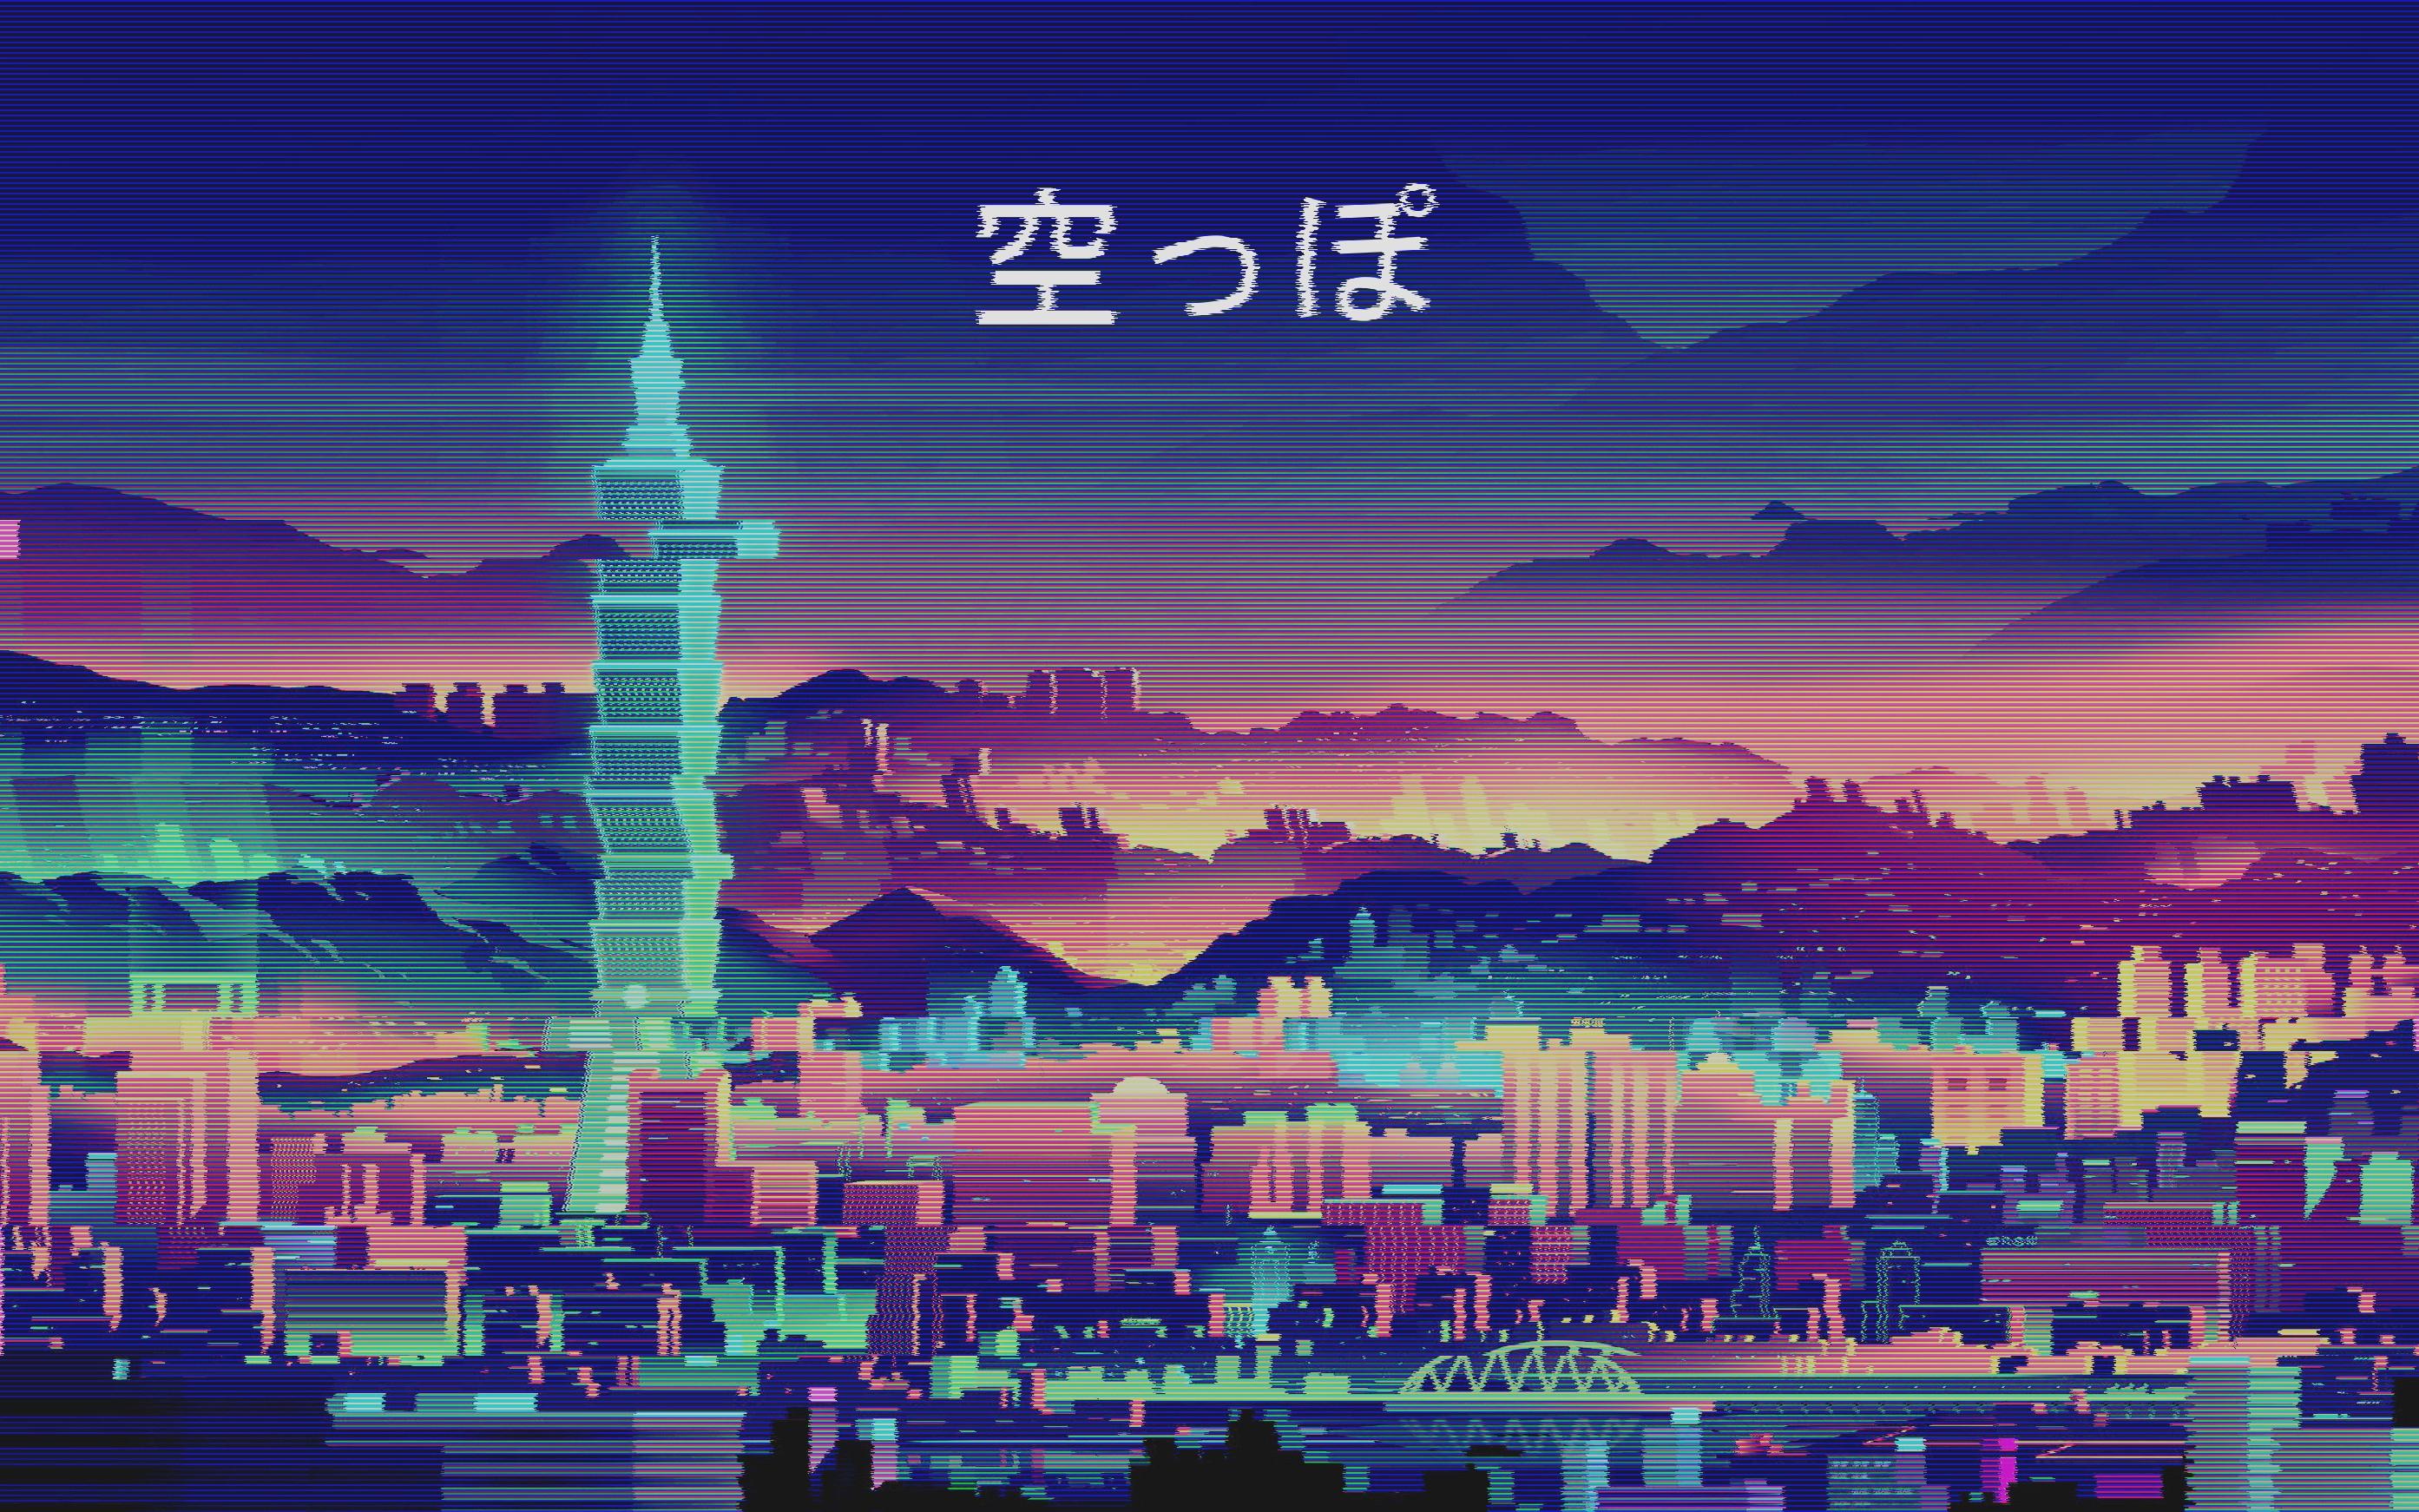 Free download Vaporwave Hd Anime City Wallpaper Cool ...